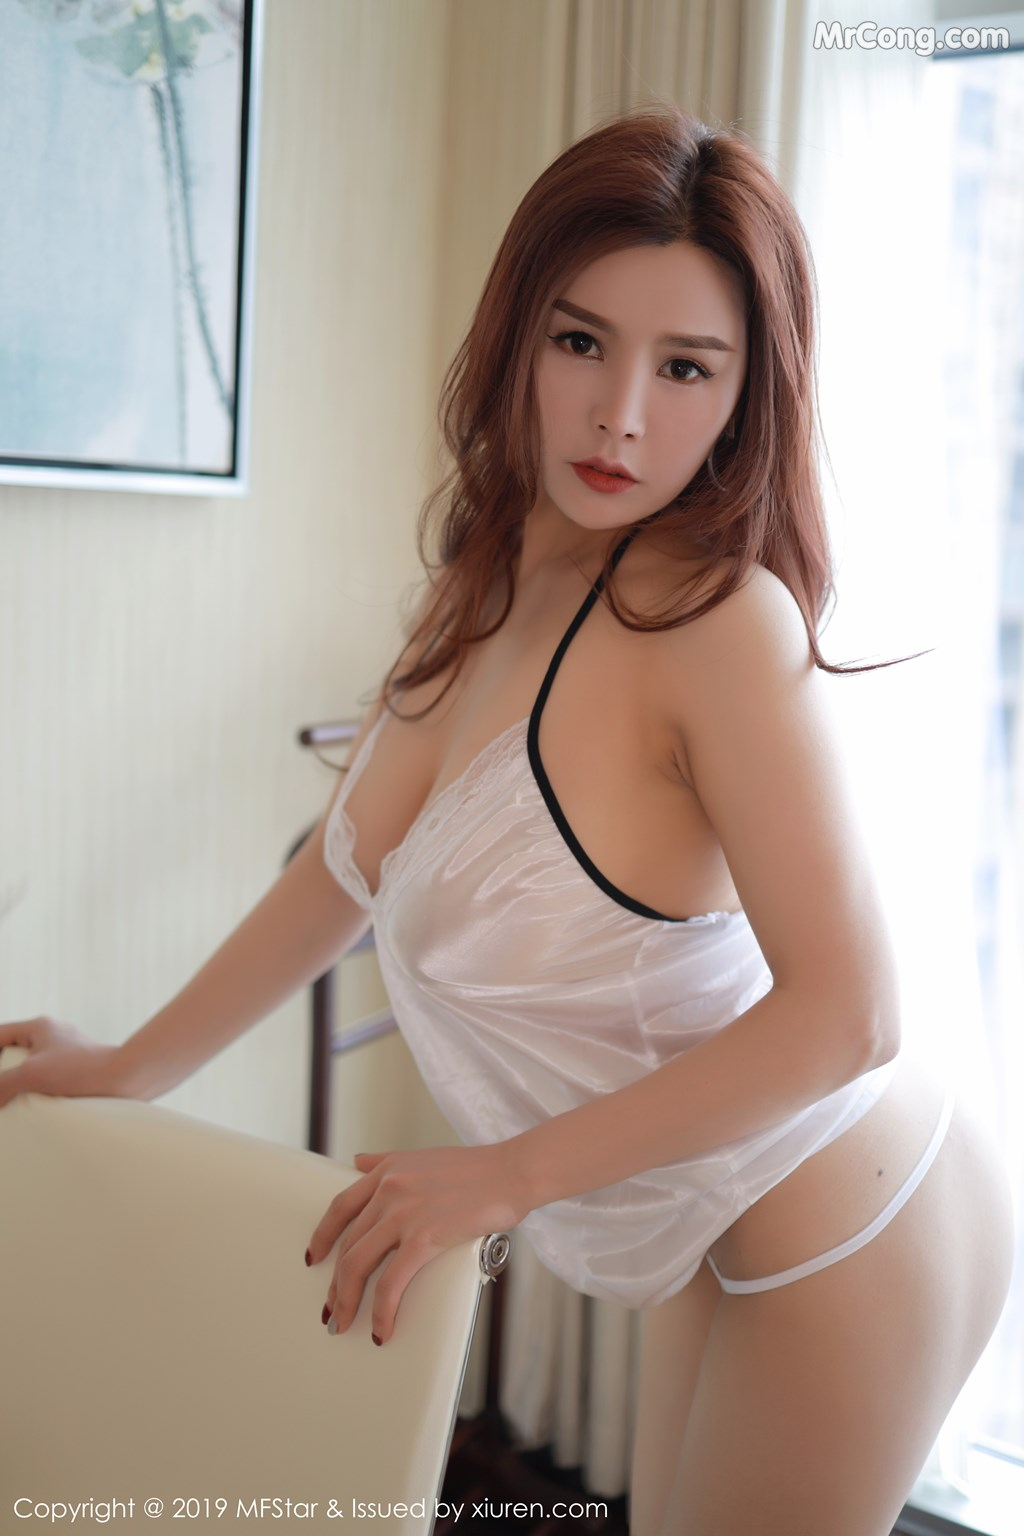 Image MFStar-Vol.185-201712-MrCong.com-006 in post MFStar Vol.185: 胡润曦201712 (41 ảnh)